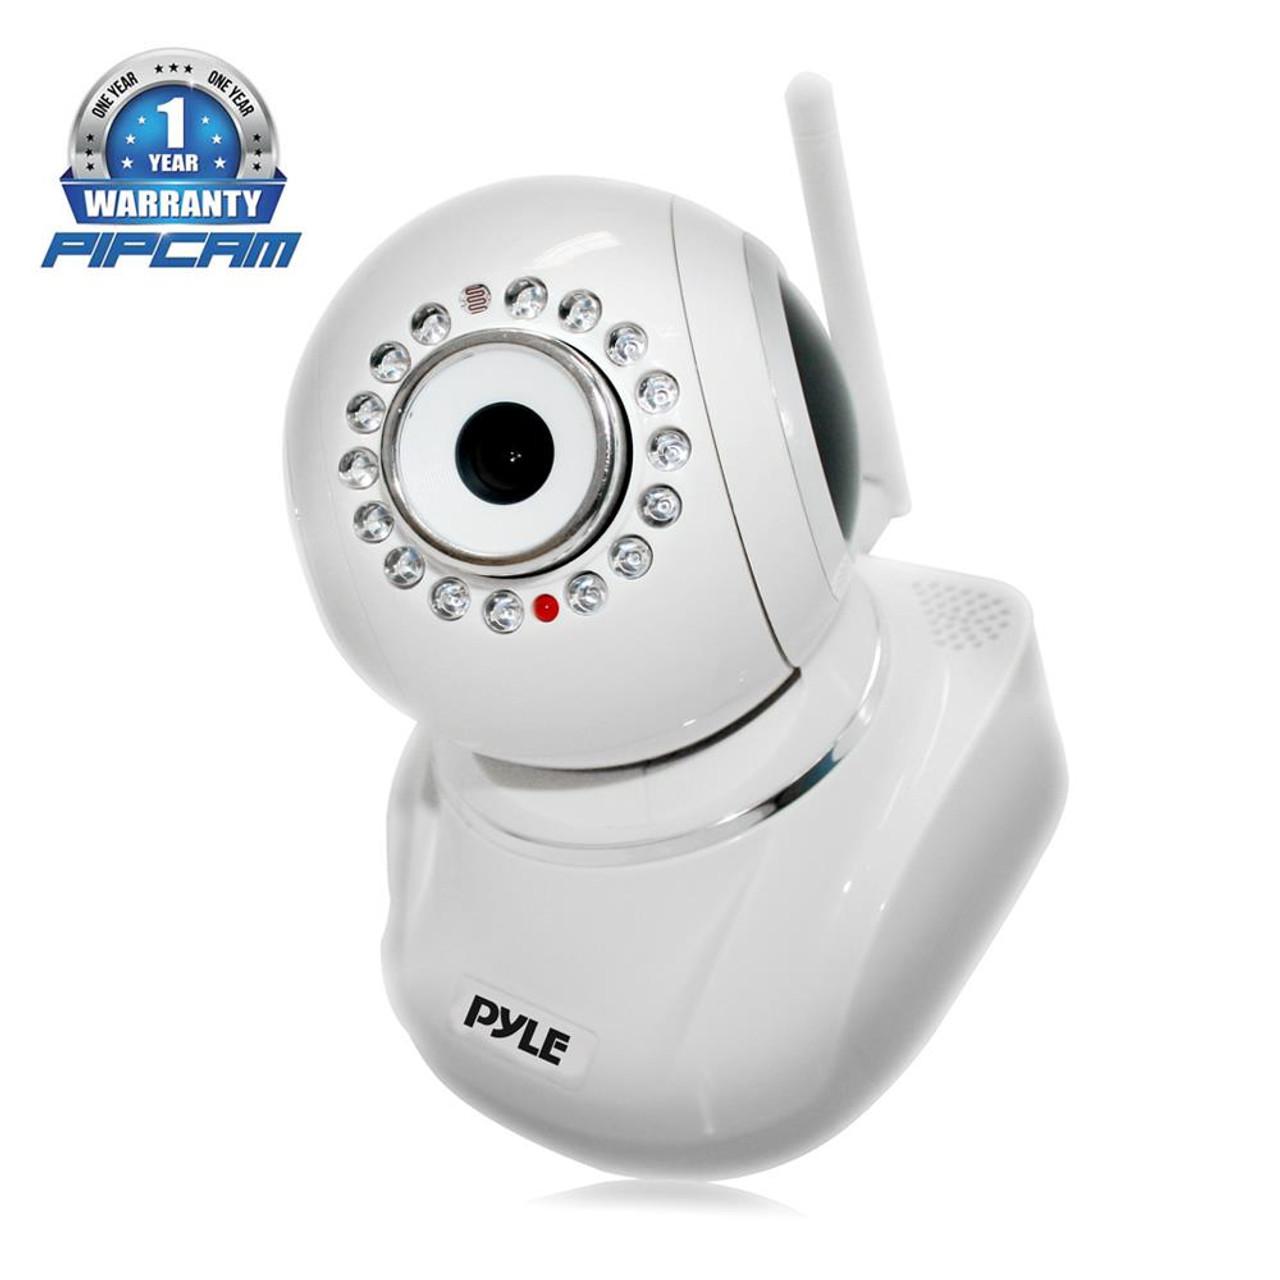 Pyle PIPCAMHD82 IP Cam Full HD 1080p WiFi Security Camera